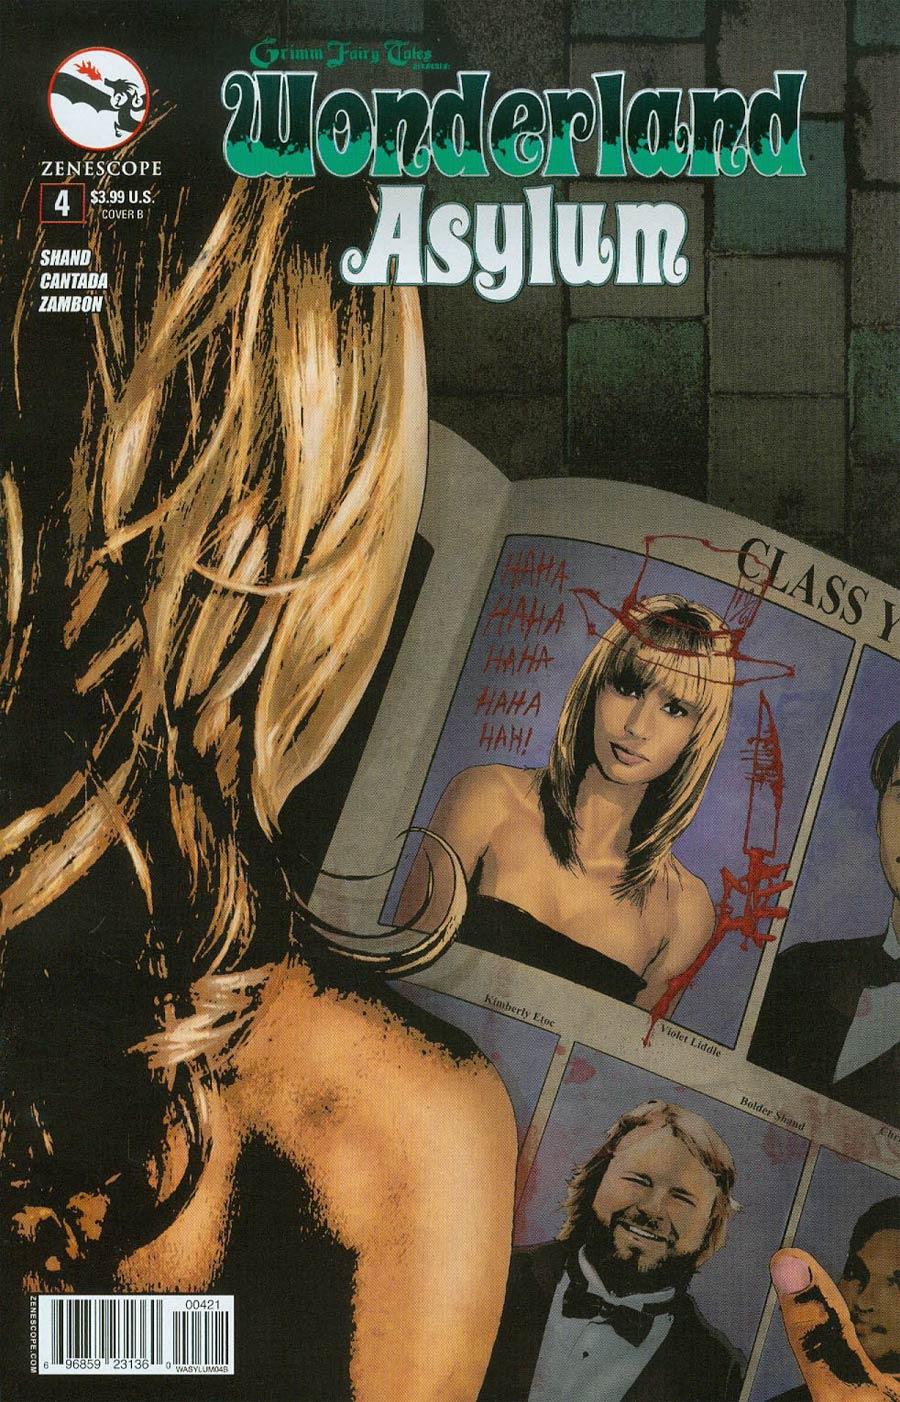 Grimm Fairy Tales Presents Wonderland Asylum #4 Cover B Christopher Cote